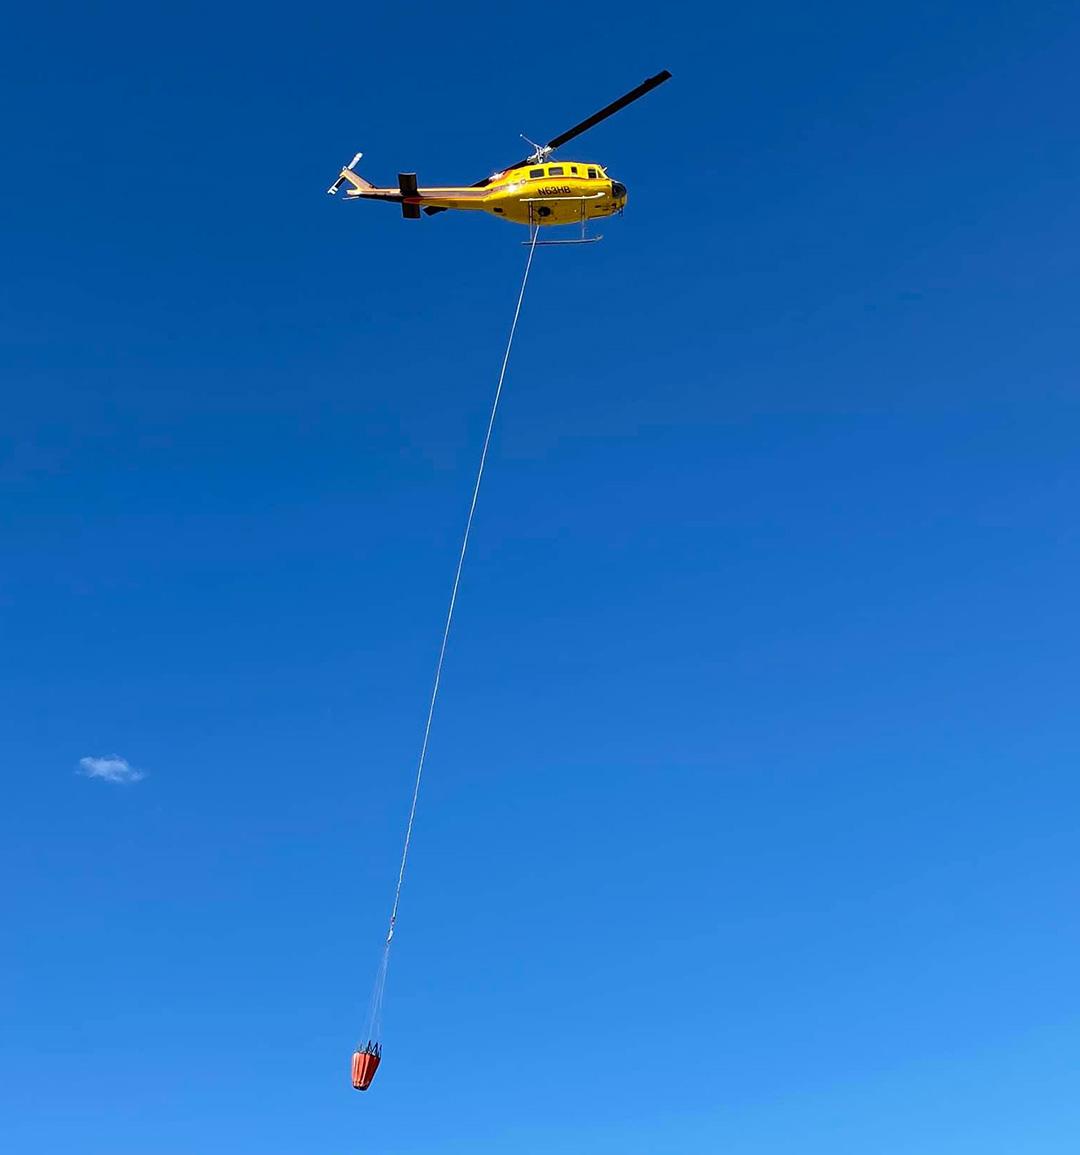 Helicóptero combate incendio